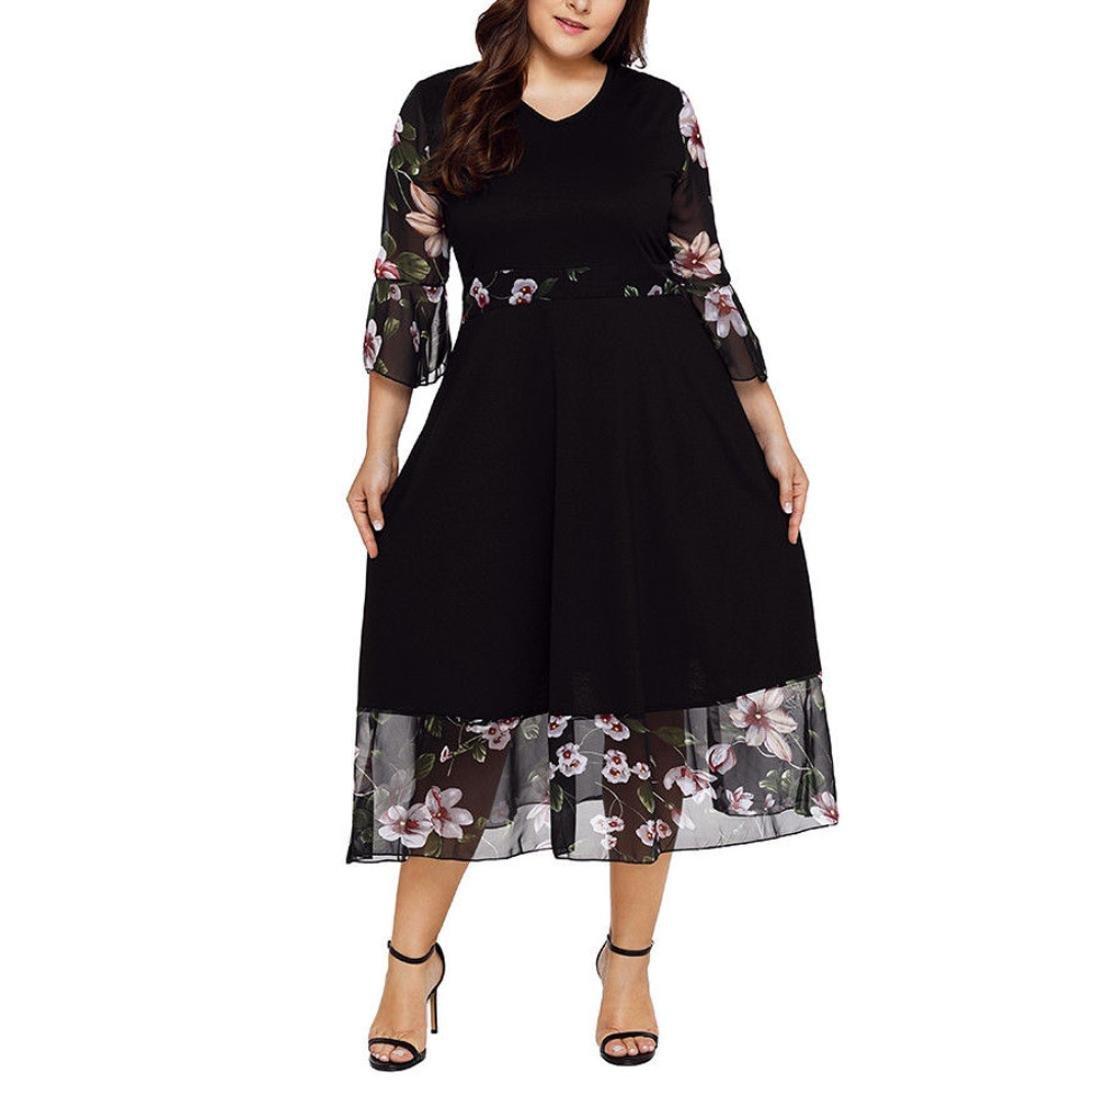 Snowfoller Elegant Women V Neck Wrap Chiffon Dresses Plus Size Bohemian Floral Long Sleeve Summer Long Dress for Dating Party (XXL, Black)